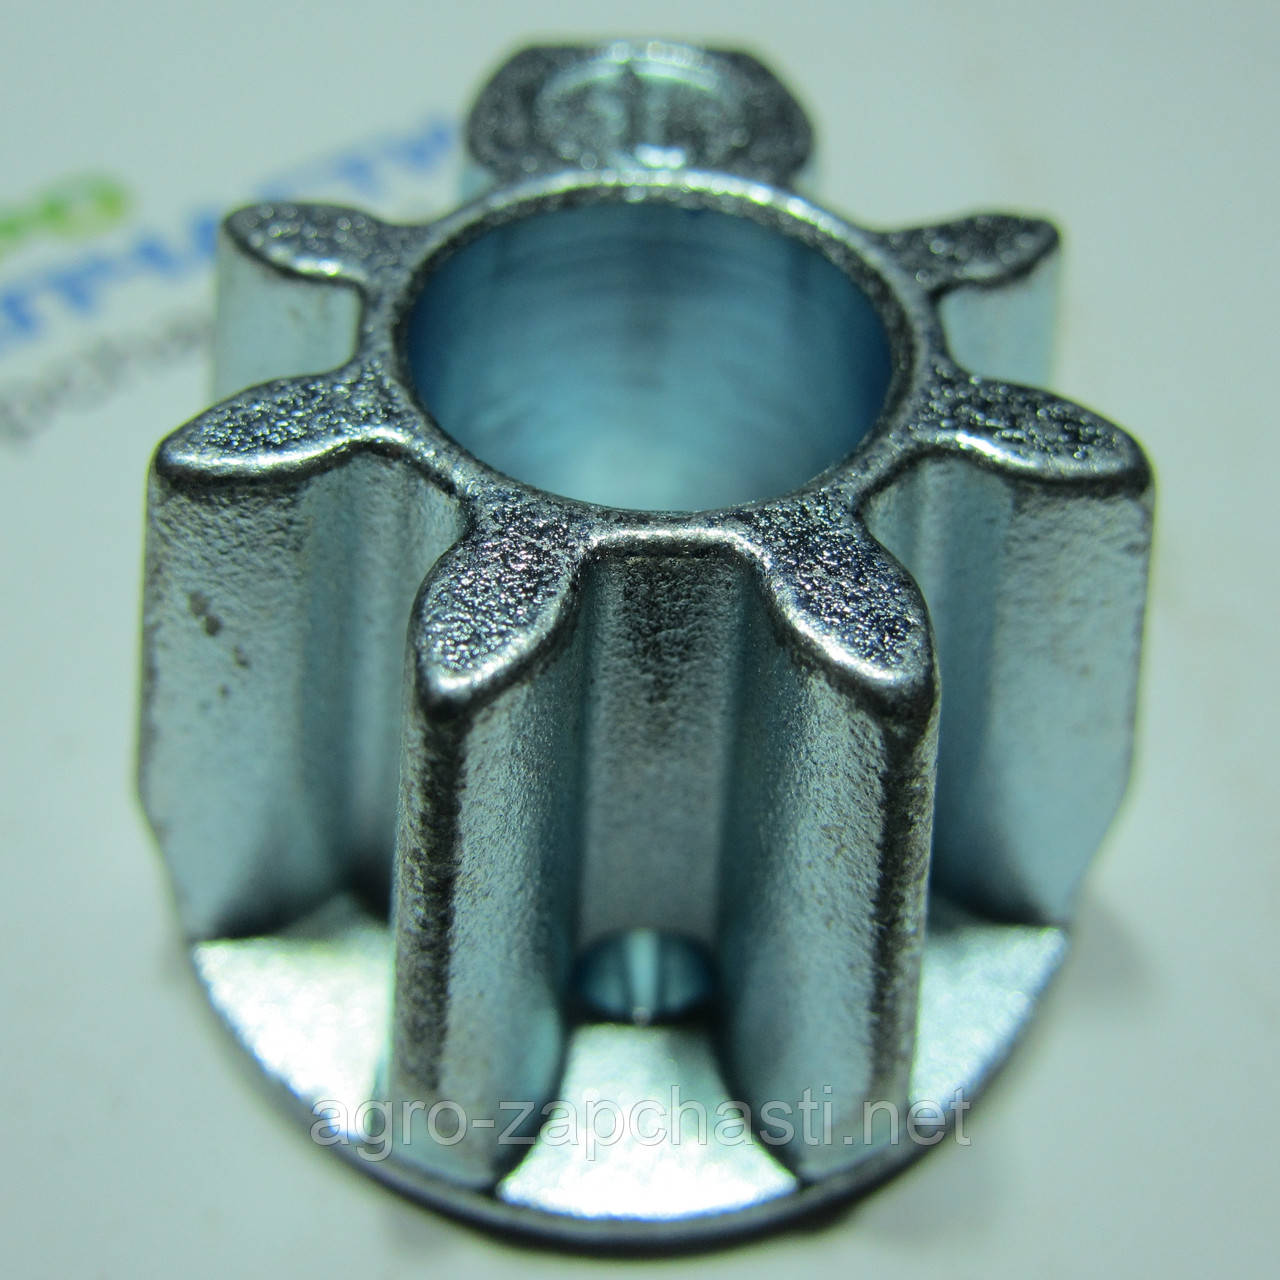 Шестерня пальца пресс-подборщика IHC, z6 (6 зубьев)